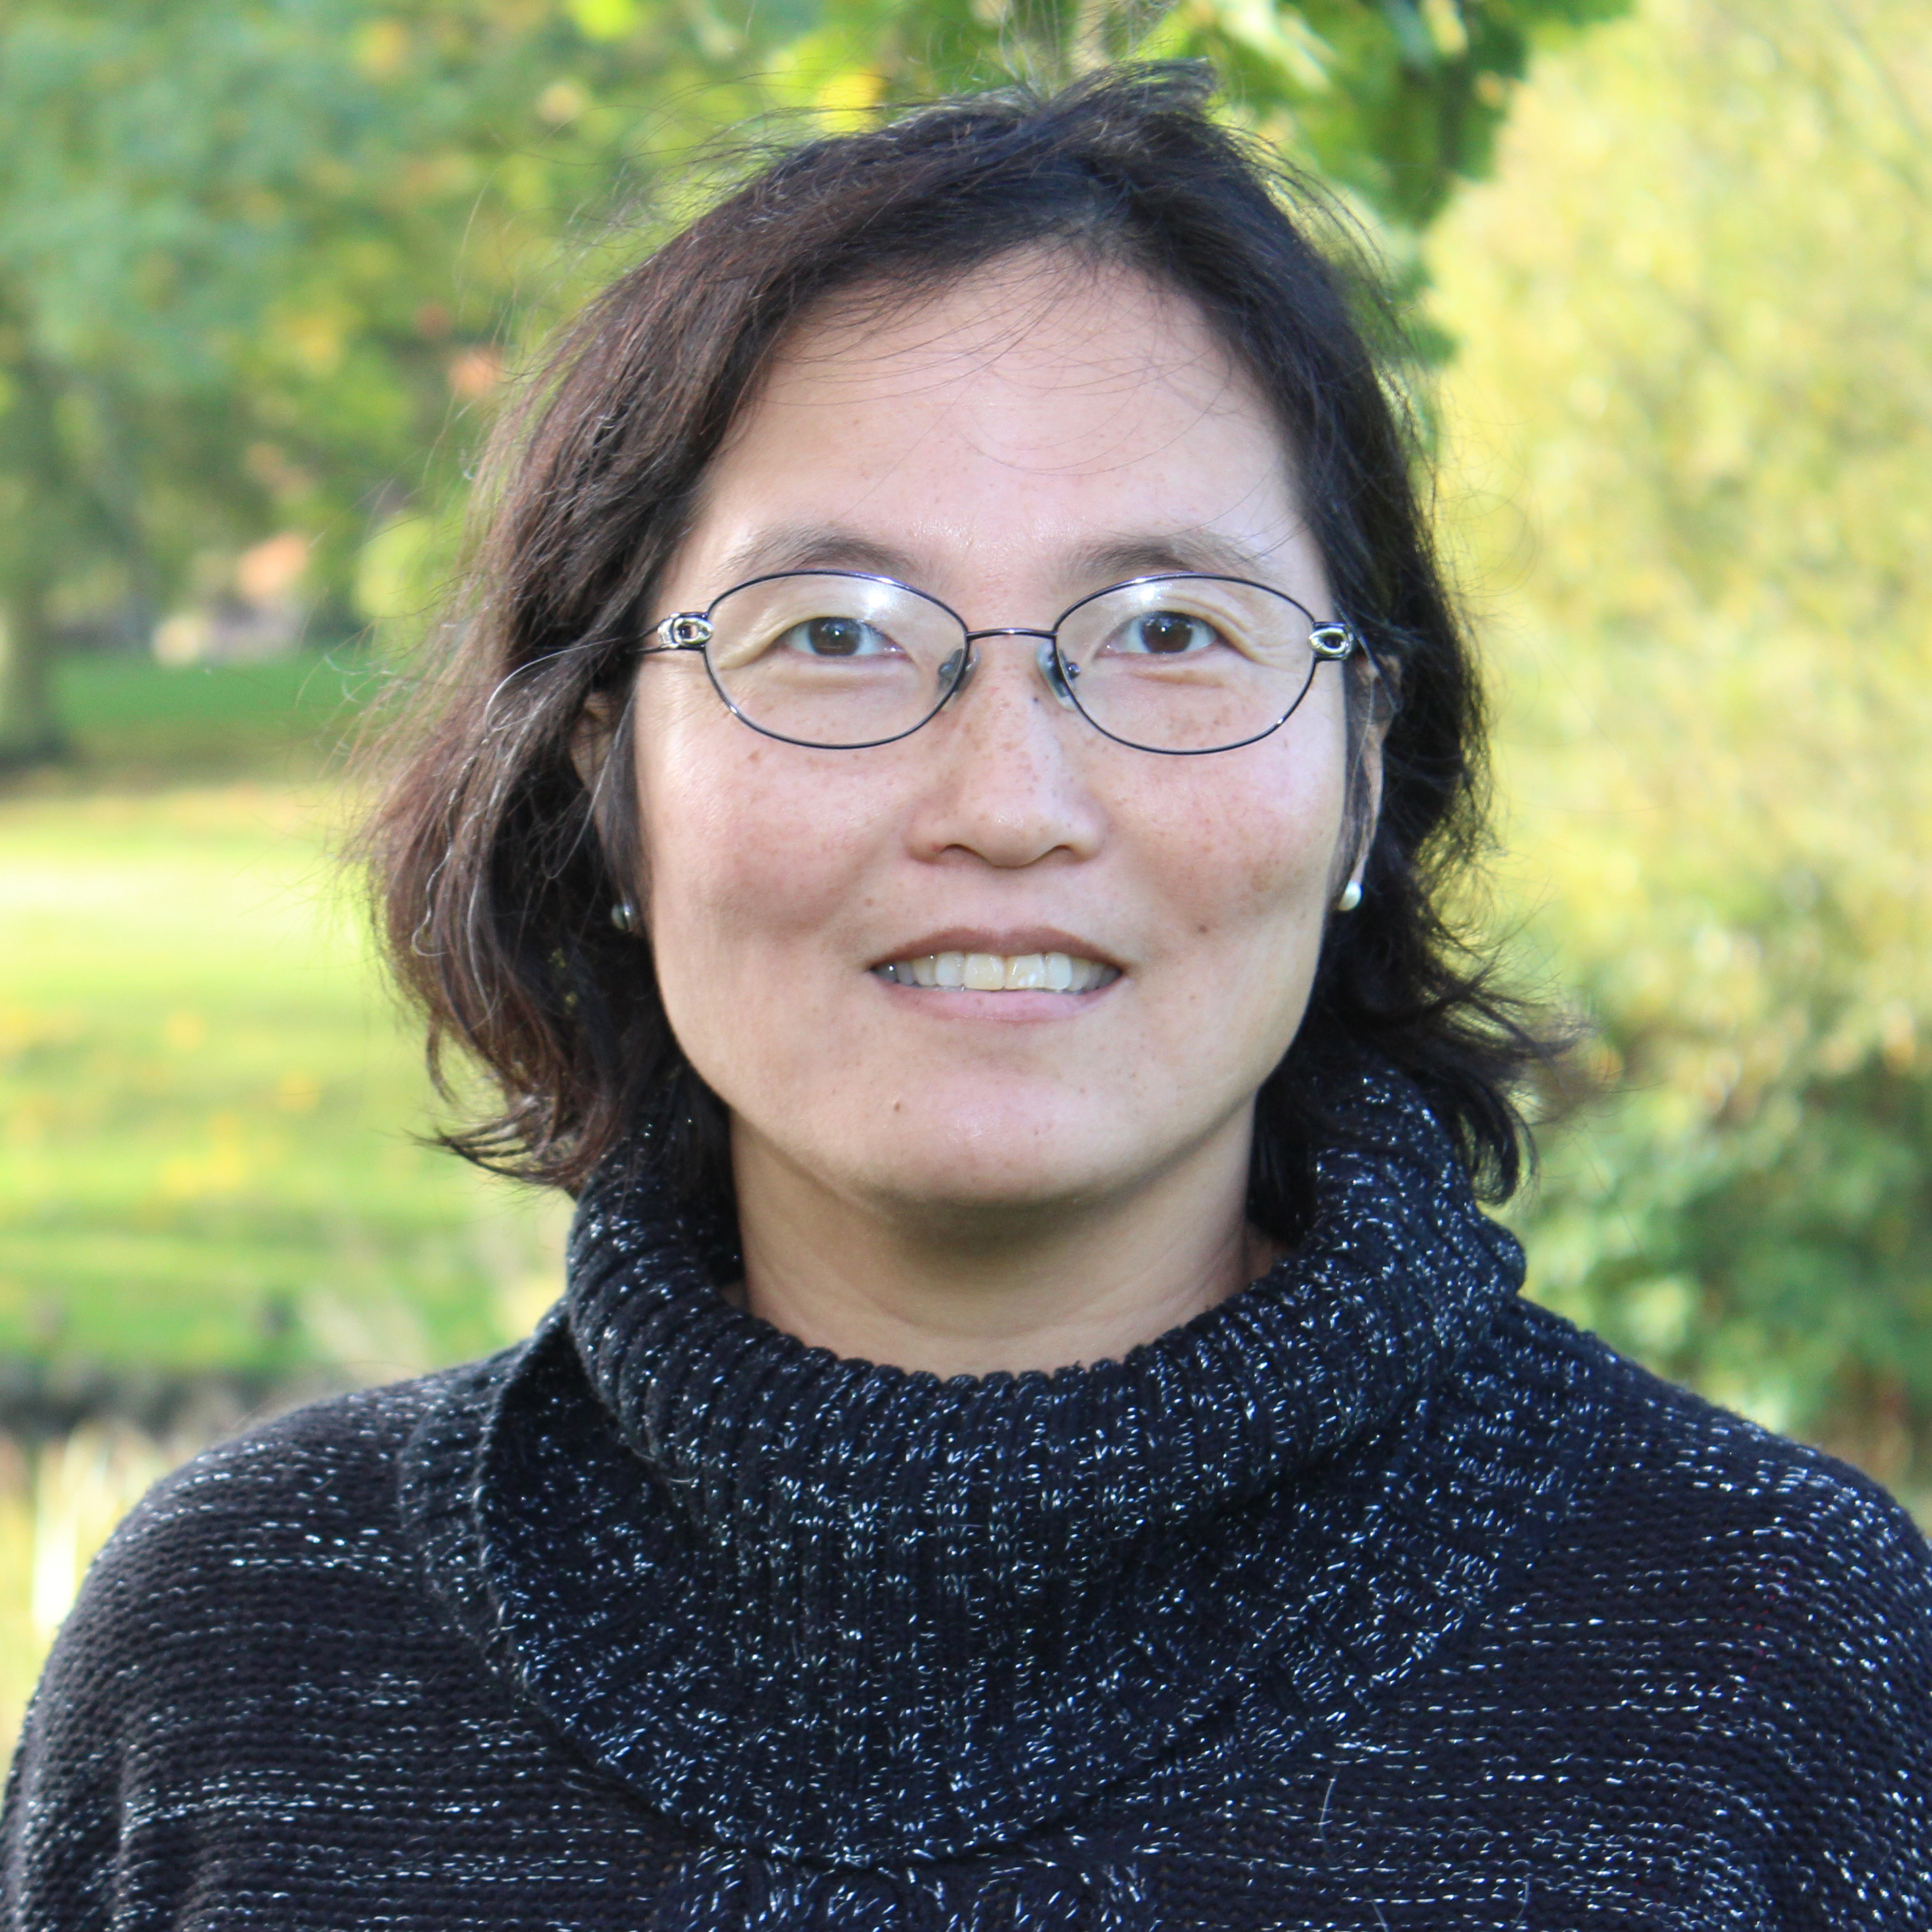 Mimi Yung Mehlsen